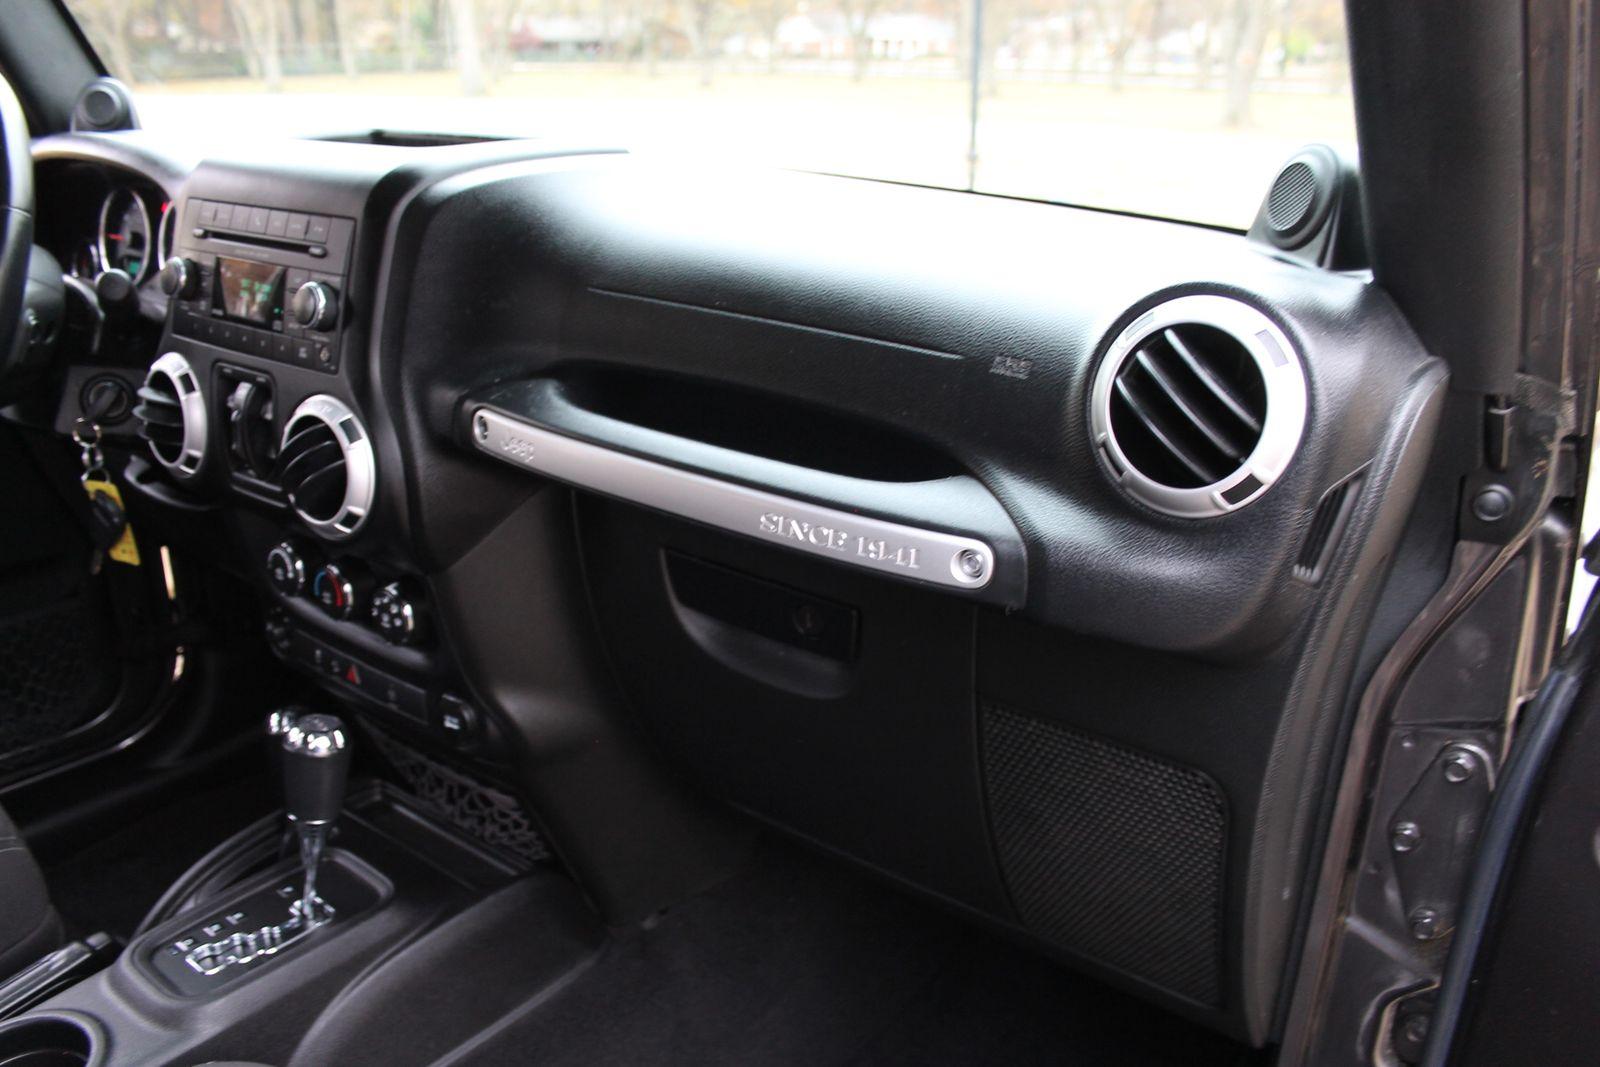 ... 2014 Jeep Wrangler Unlimited Sahara 4x4 price - Used Cars Memphis -  Hallum Motors citystatezip in ...